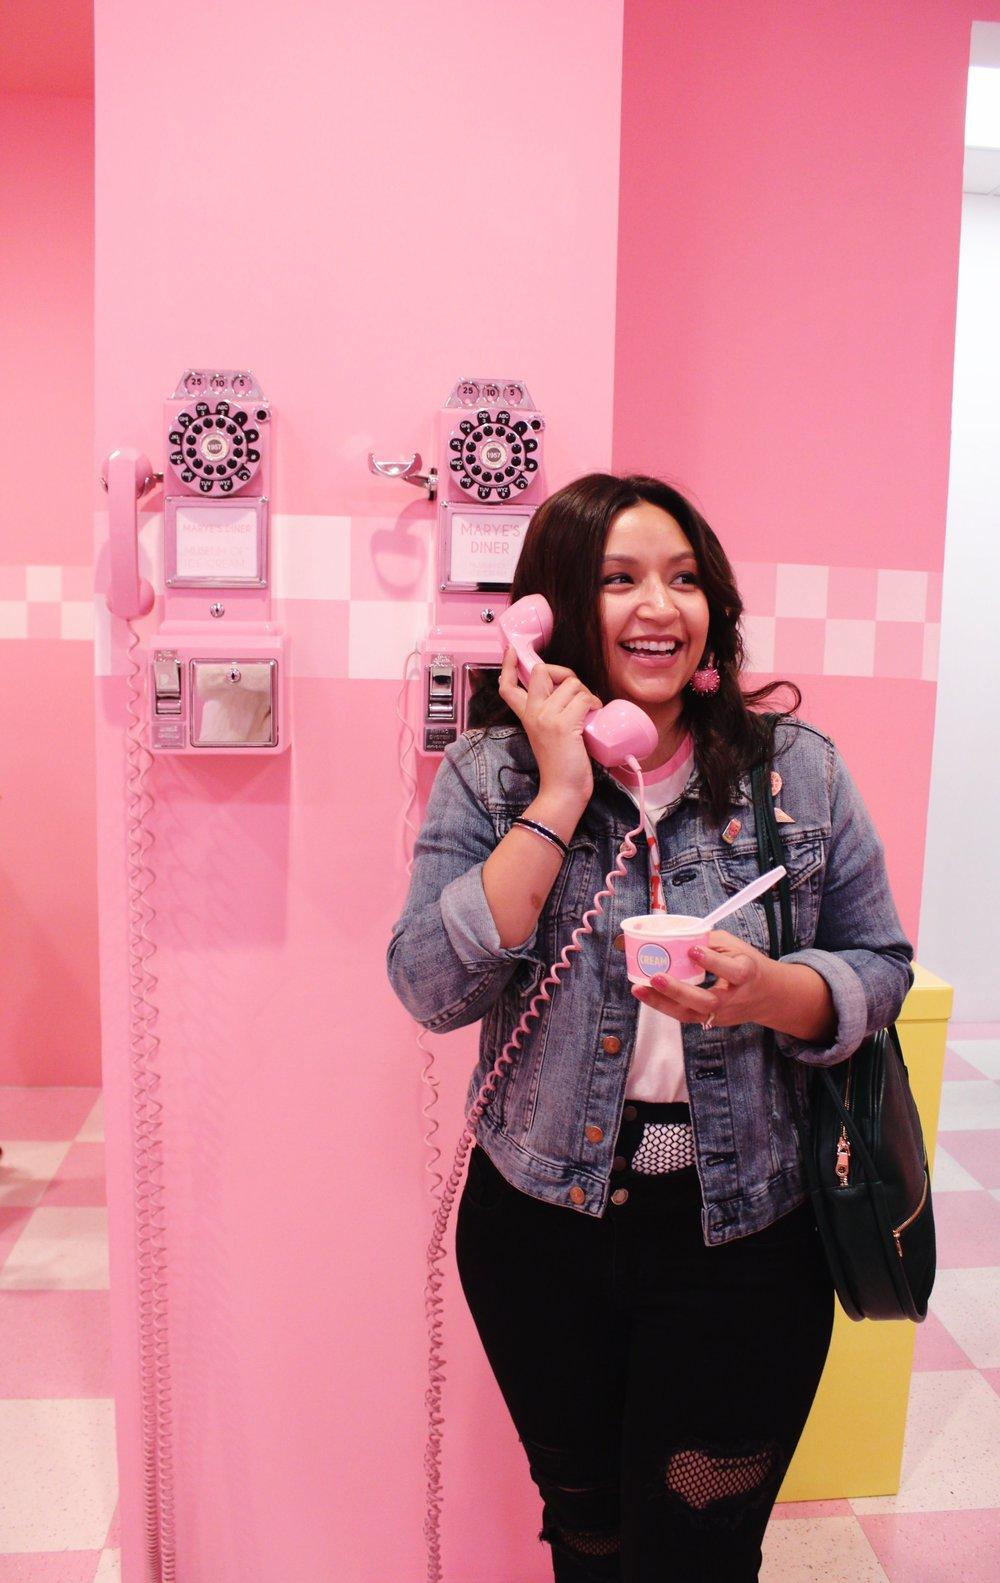 Pink Telephone, Museum of Ice Cream, Denim Jacket